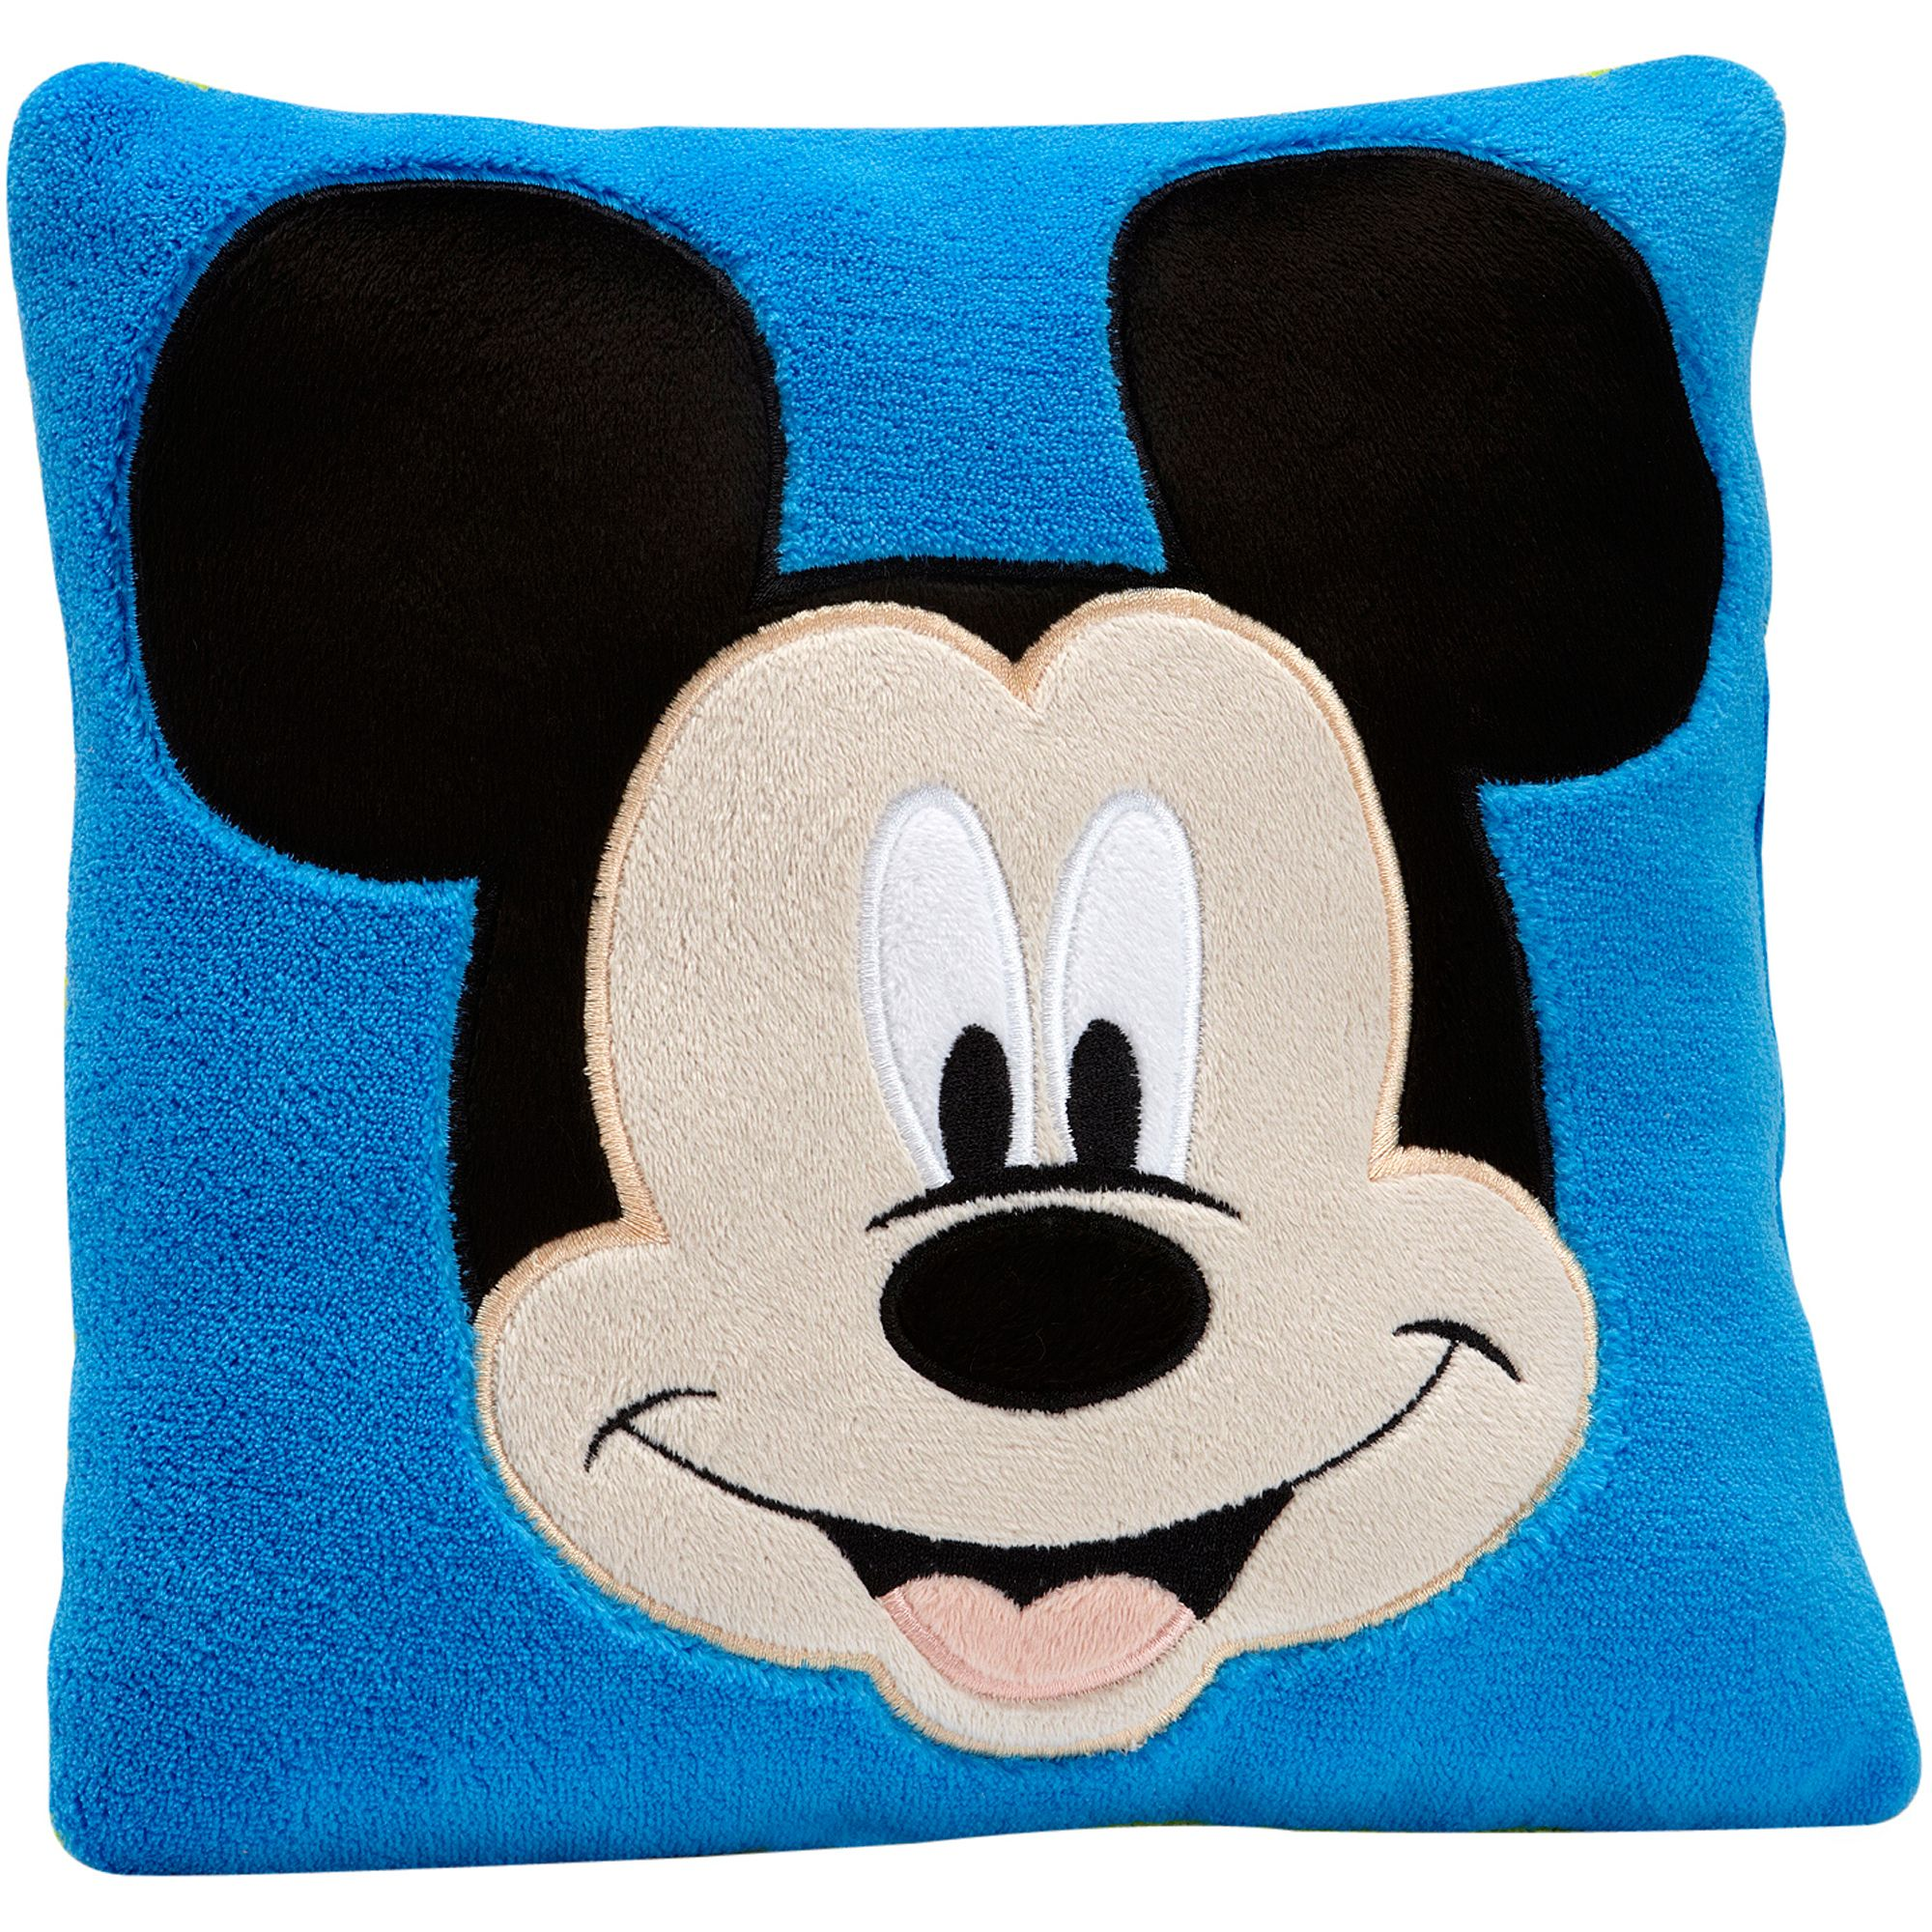 disney character decorative pillows in various characters walmart com